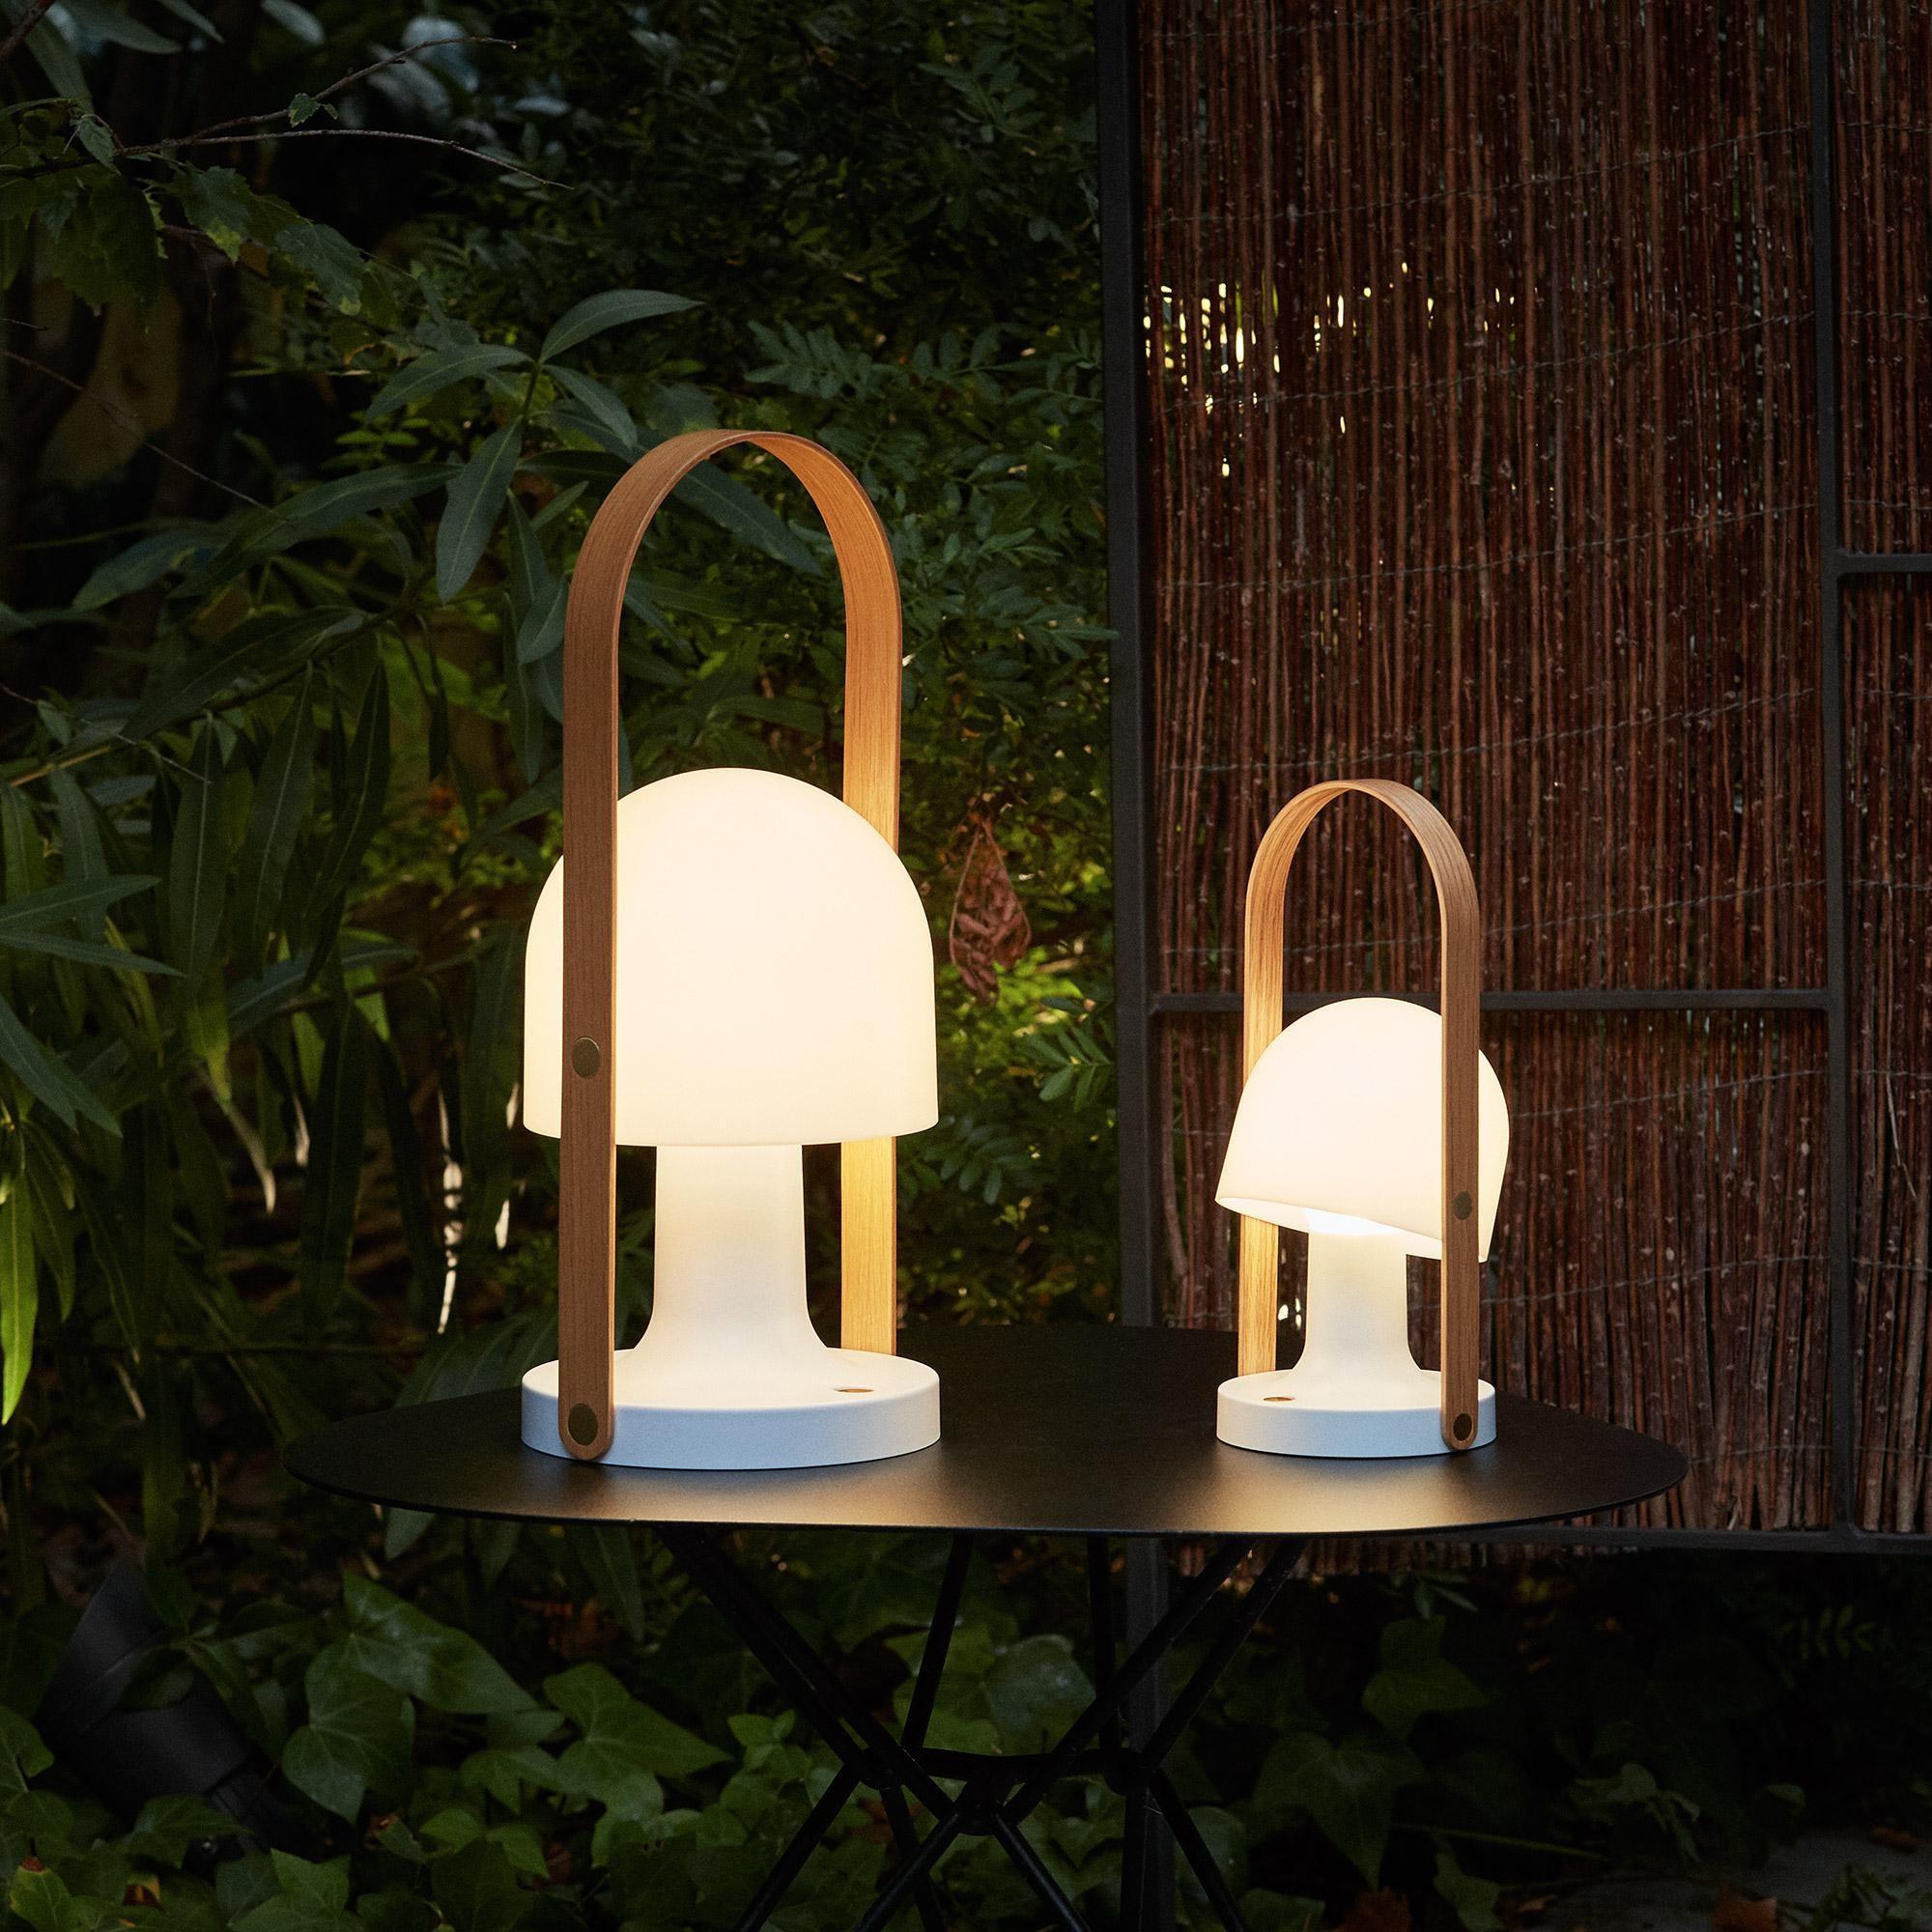 Marset Followme Led Lamp Ambientedirect Outdoor Landscape Lighting On Wiring Diagram For Garden Lights